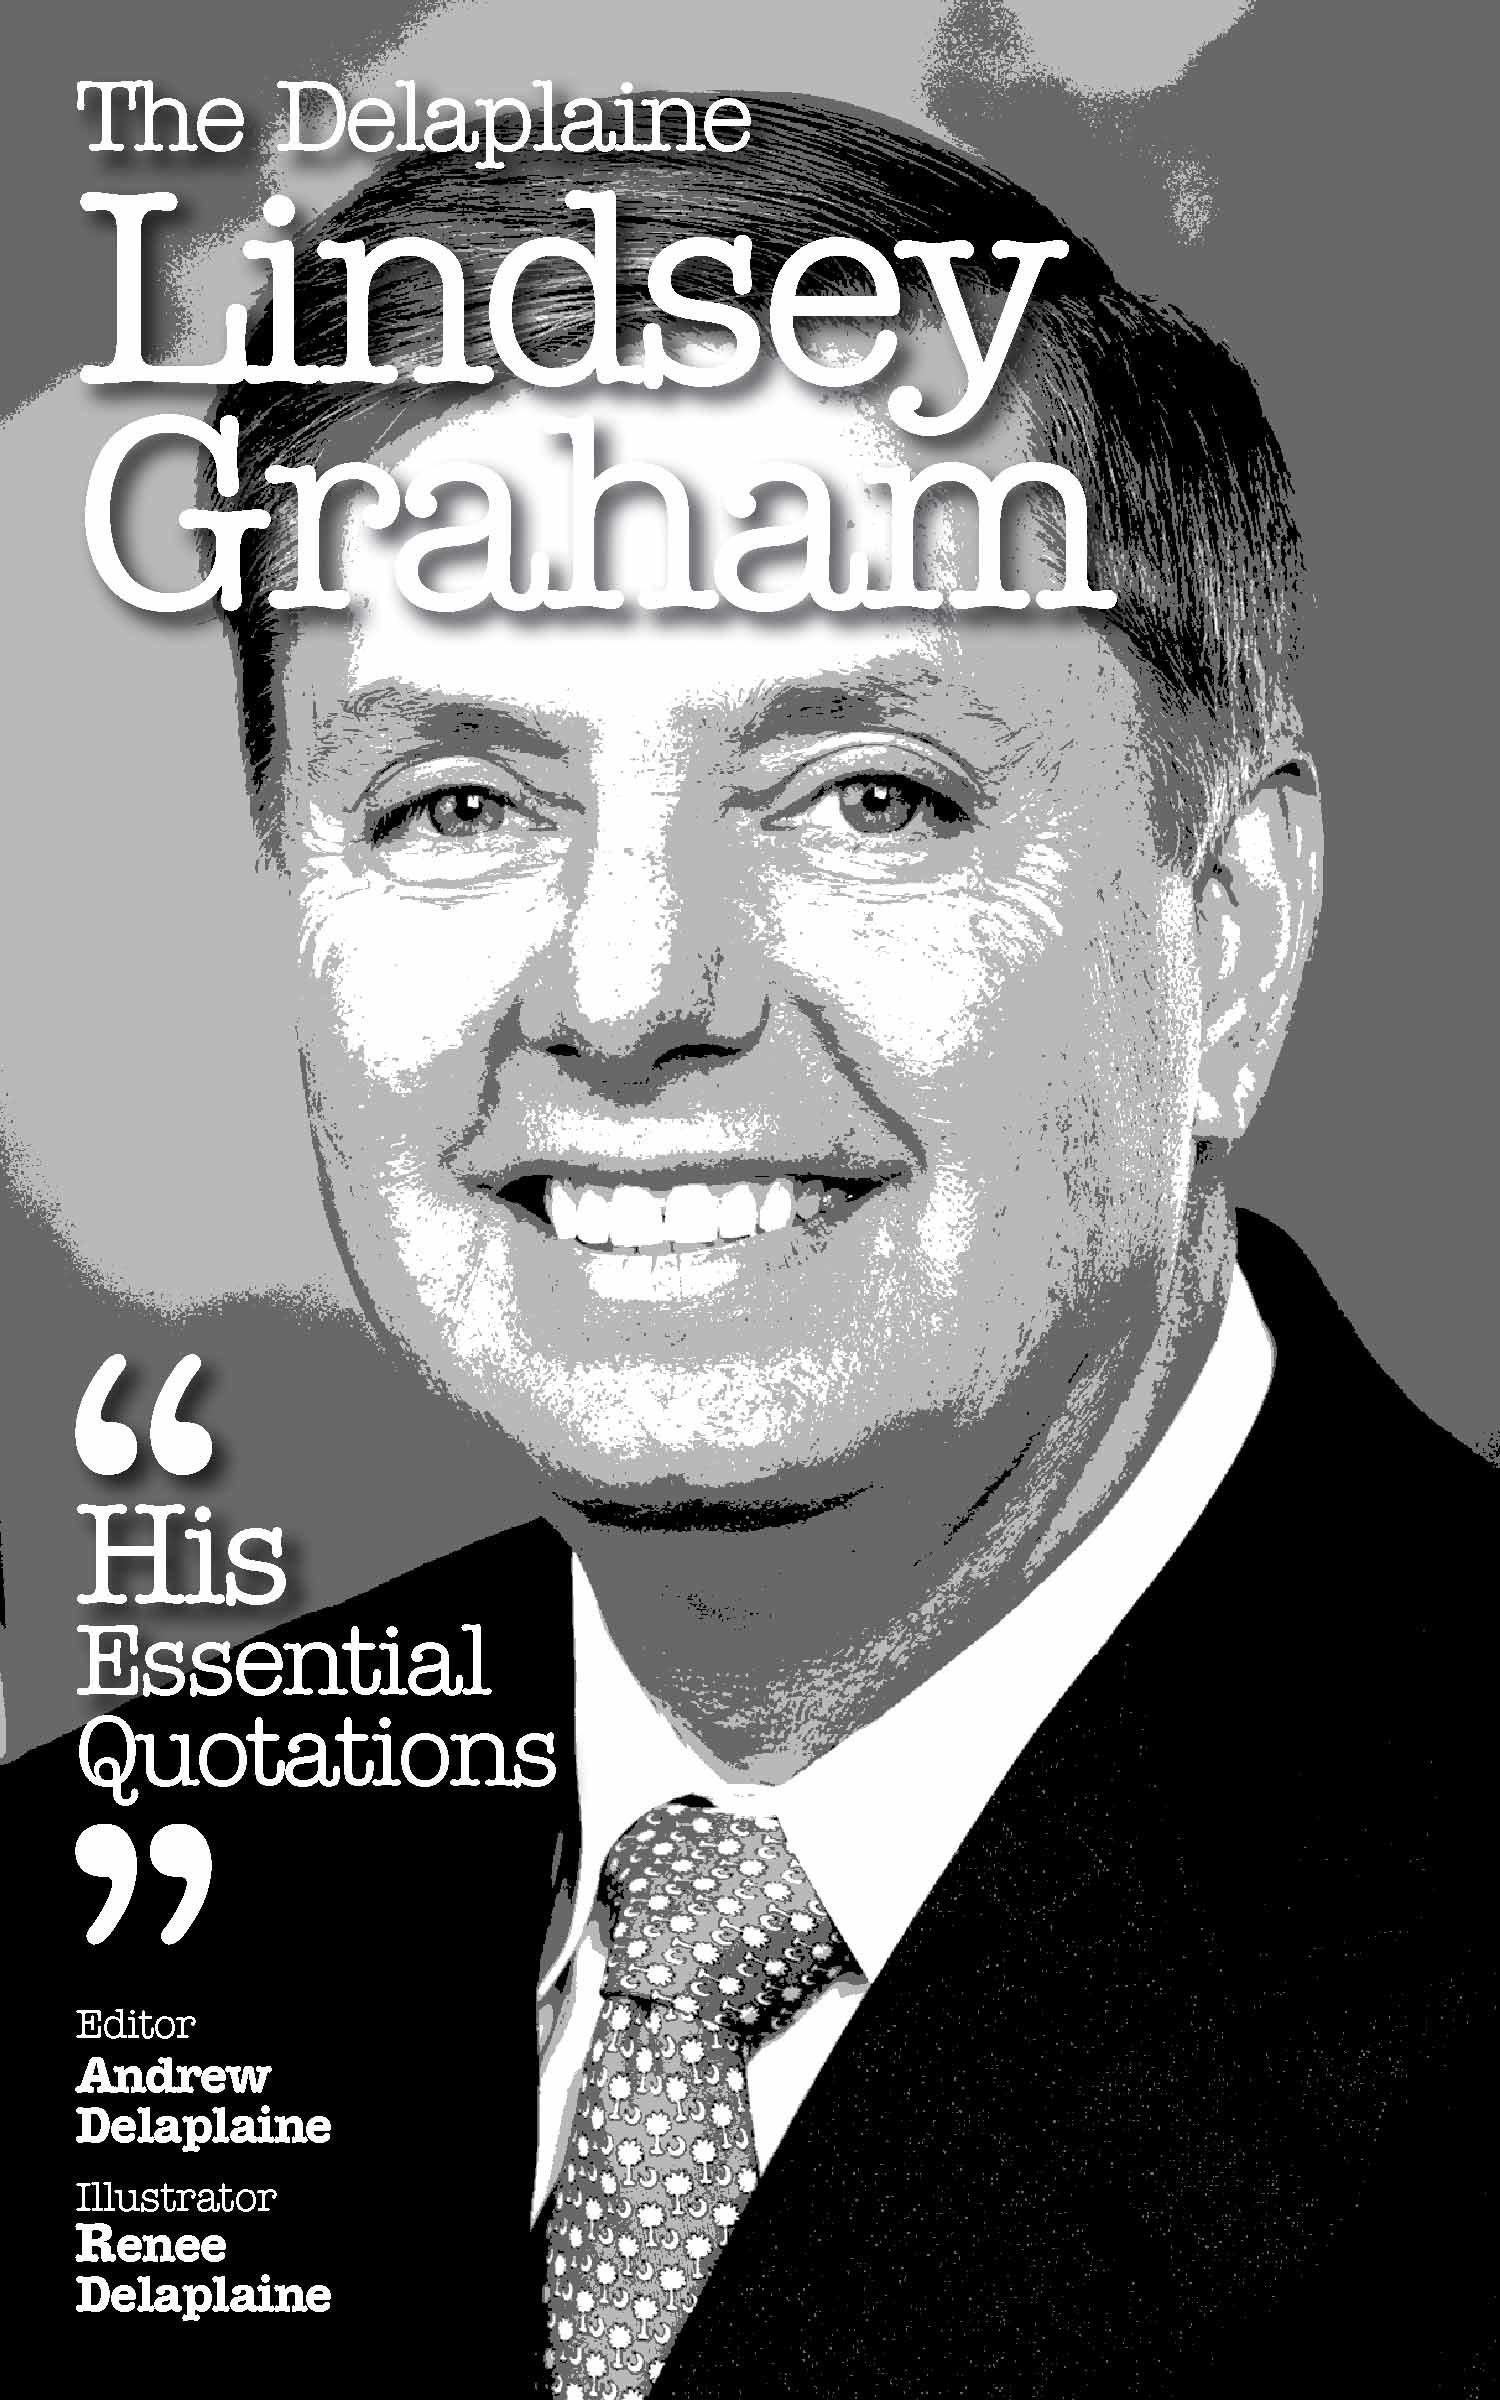 The Delaplaine Lindsey Graham: His Essential Quotations  by  Andrew Delaplaine